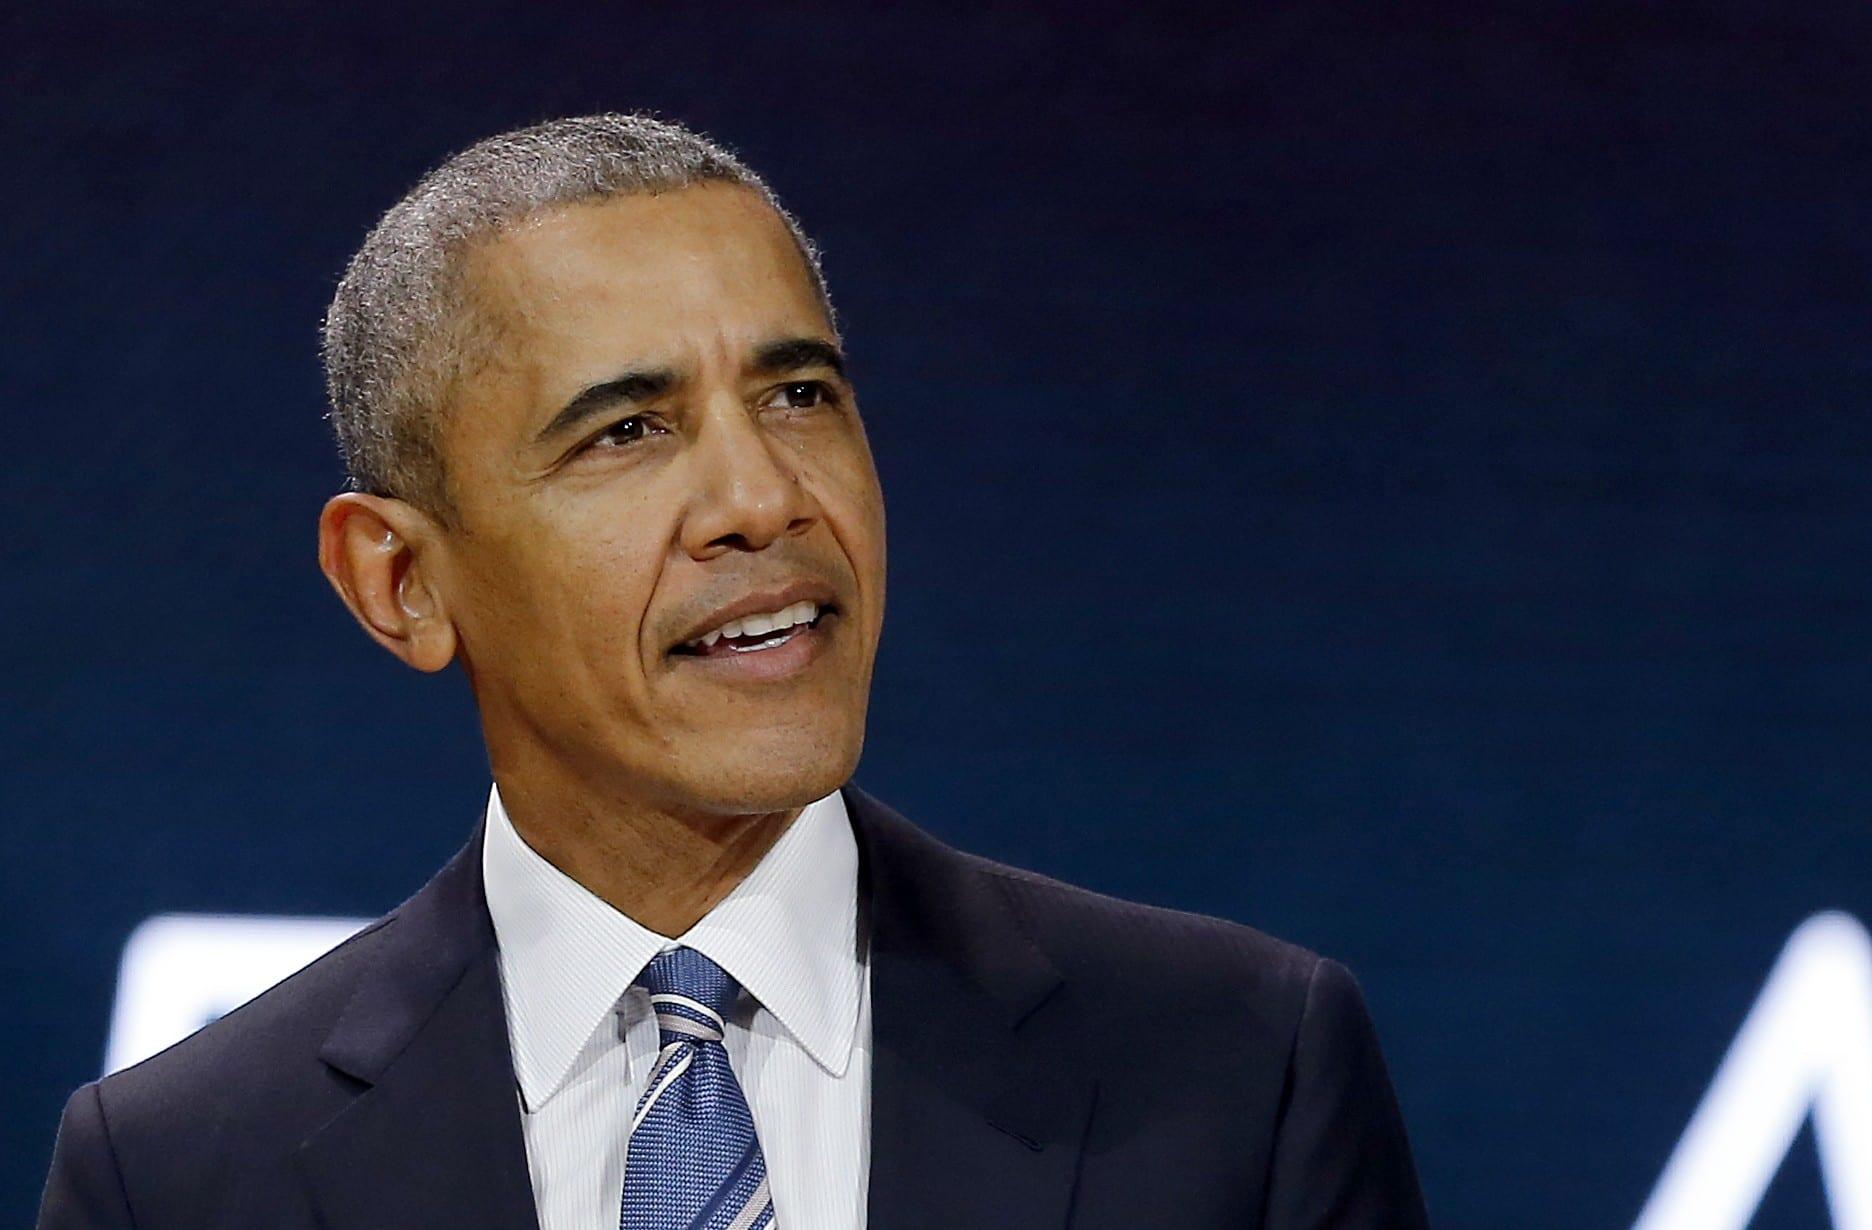 L'héritage de Barack Obama est remis en cause